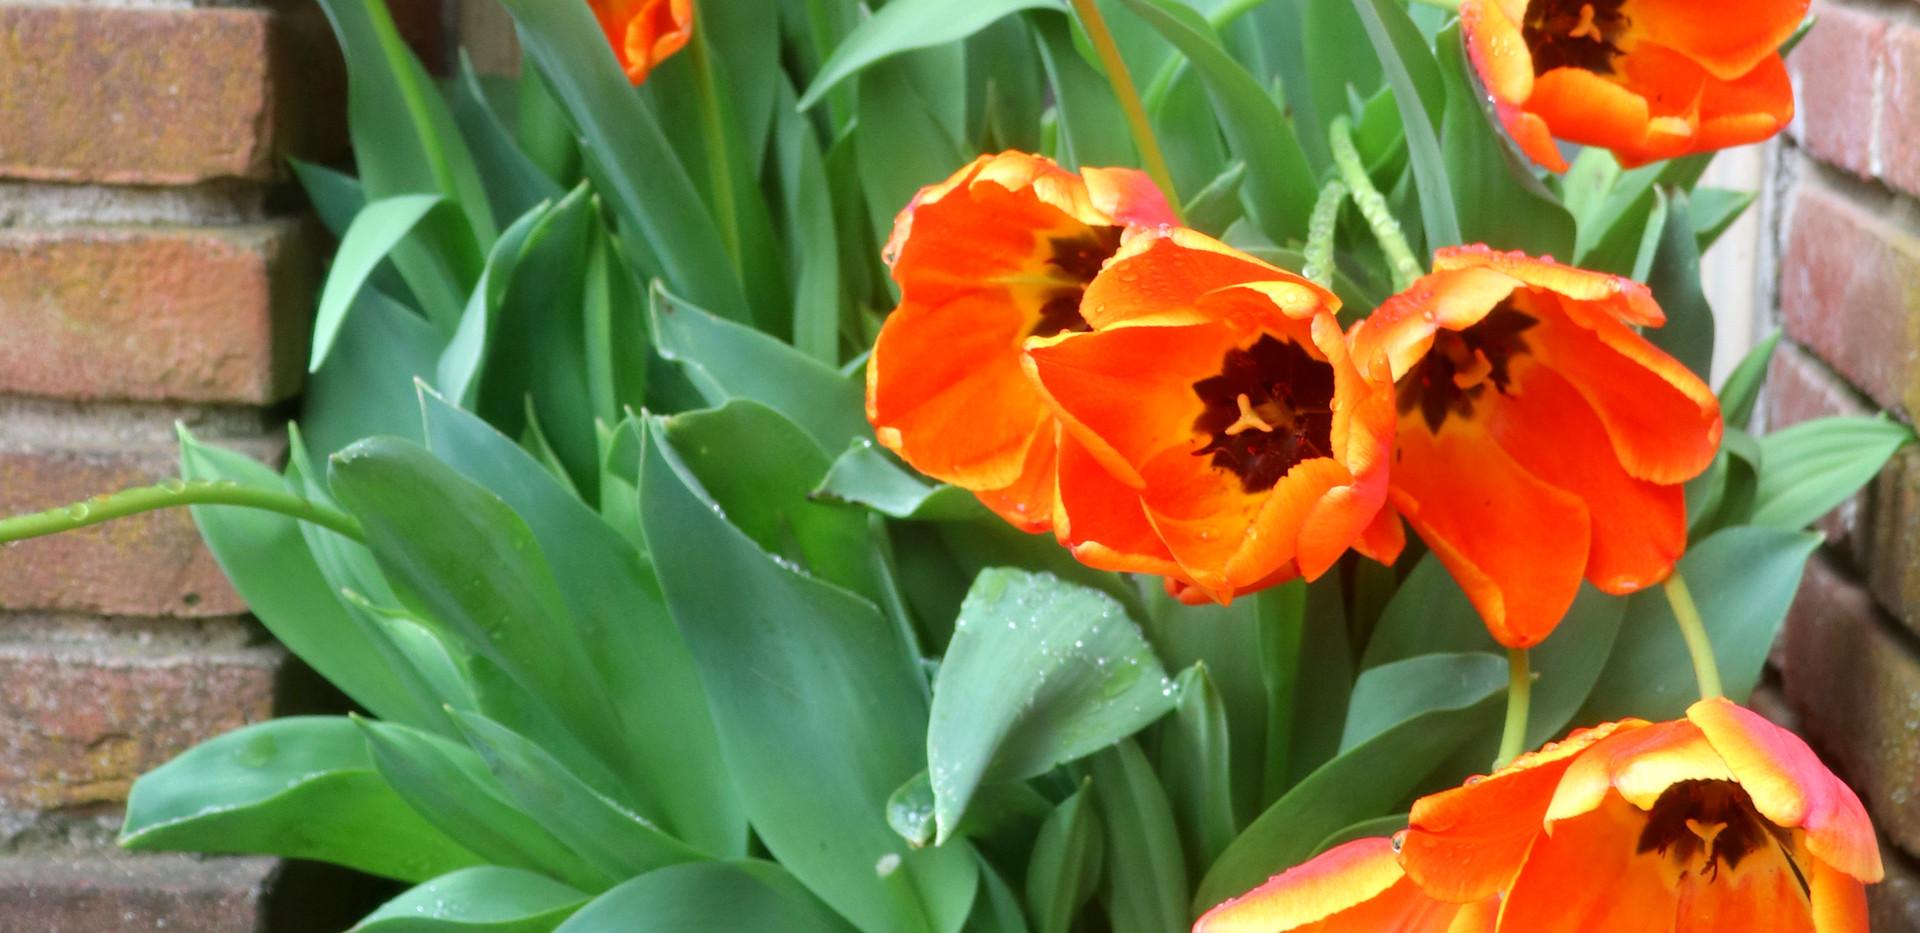 Filoli orange tulips